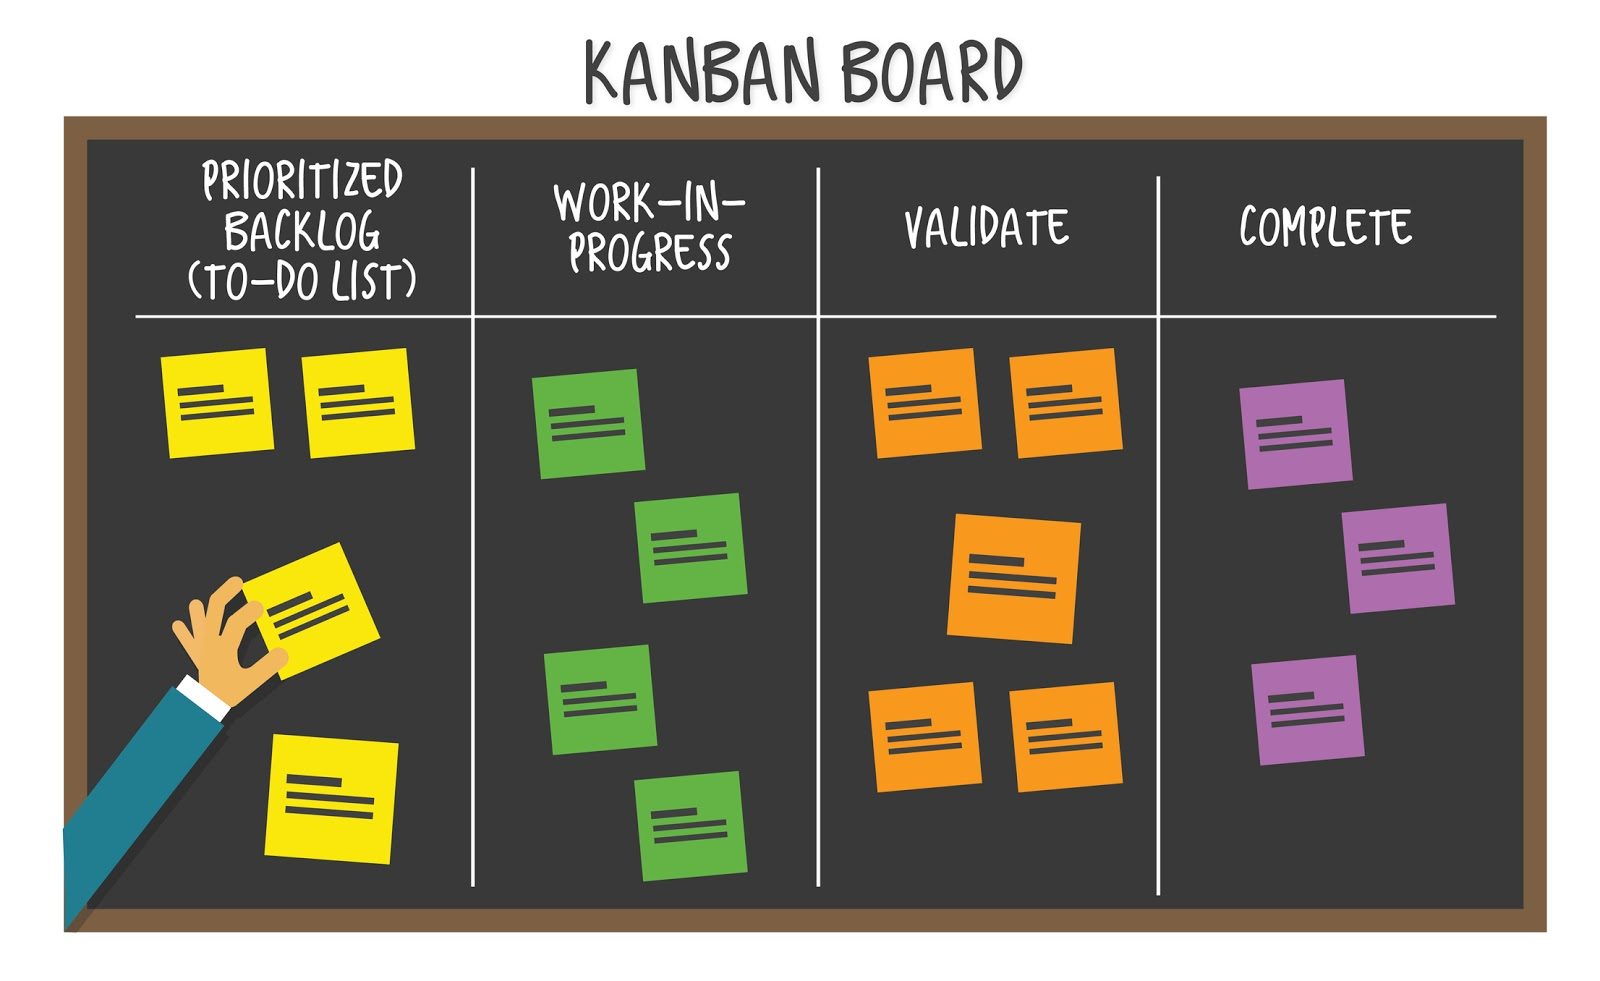 Scrum_vs_Kanban_Board_Building_Project_Plan_1.jpg